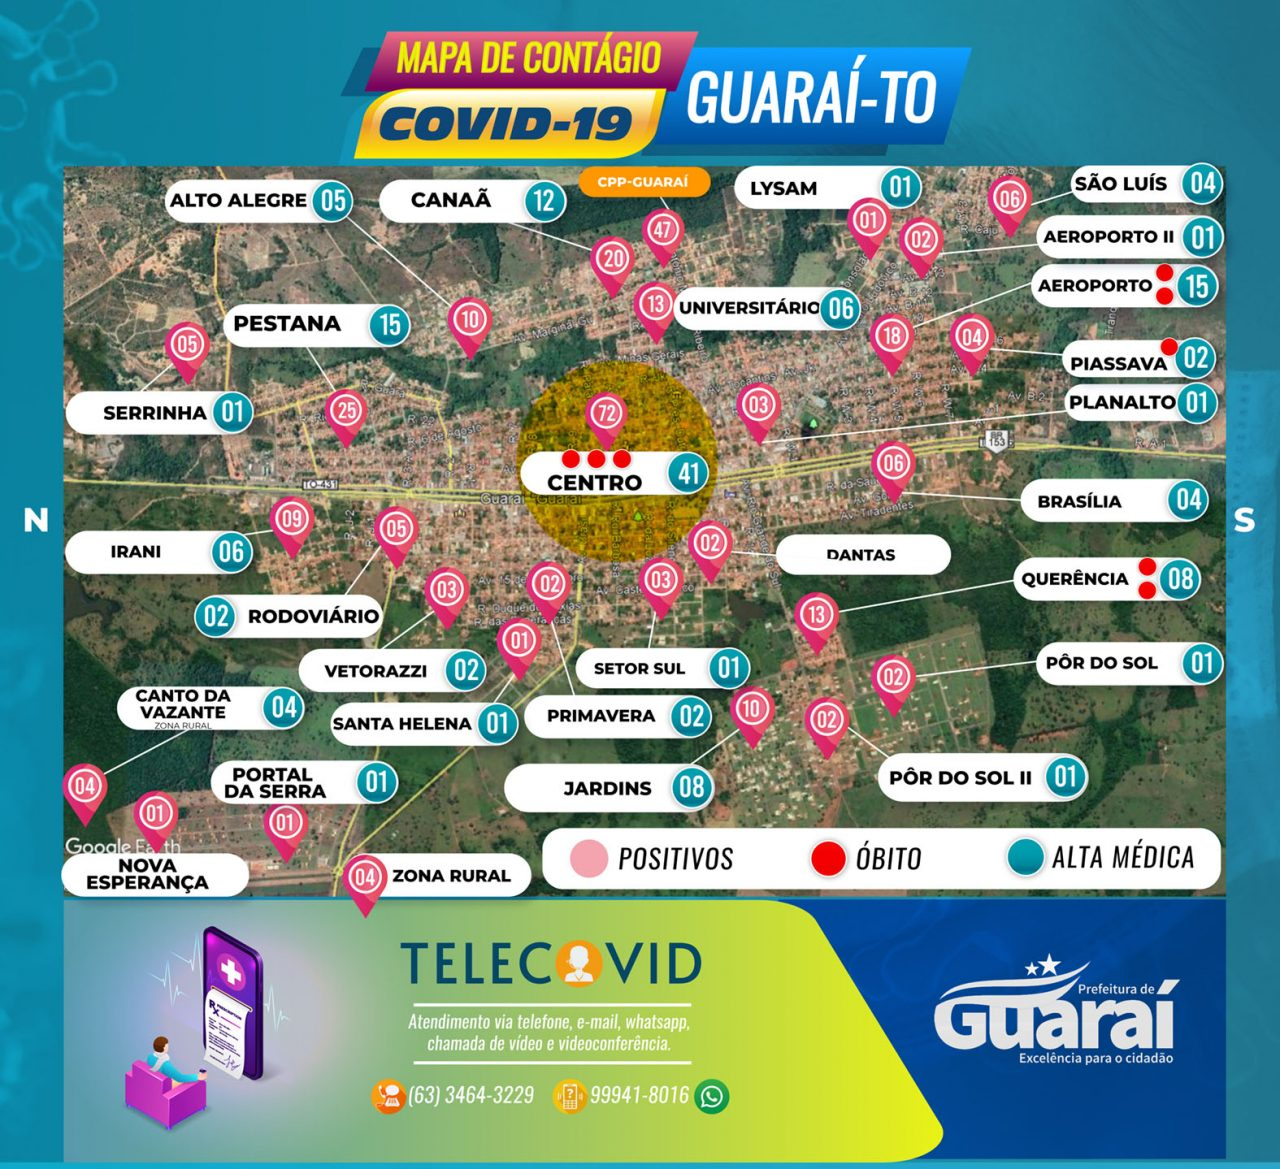 MAPA GUARAI COVID19 SÁBADO 11 DE JULHO 1280x1169 - PaineI Guaraí-TO / Covid-19 / Boletim 11 de Julho (Sábado) 14:00